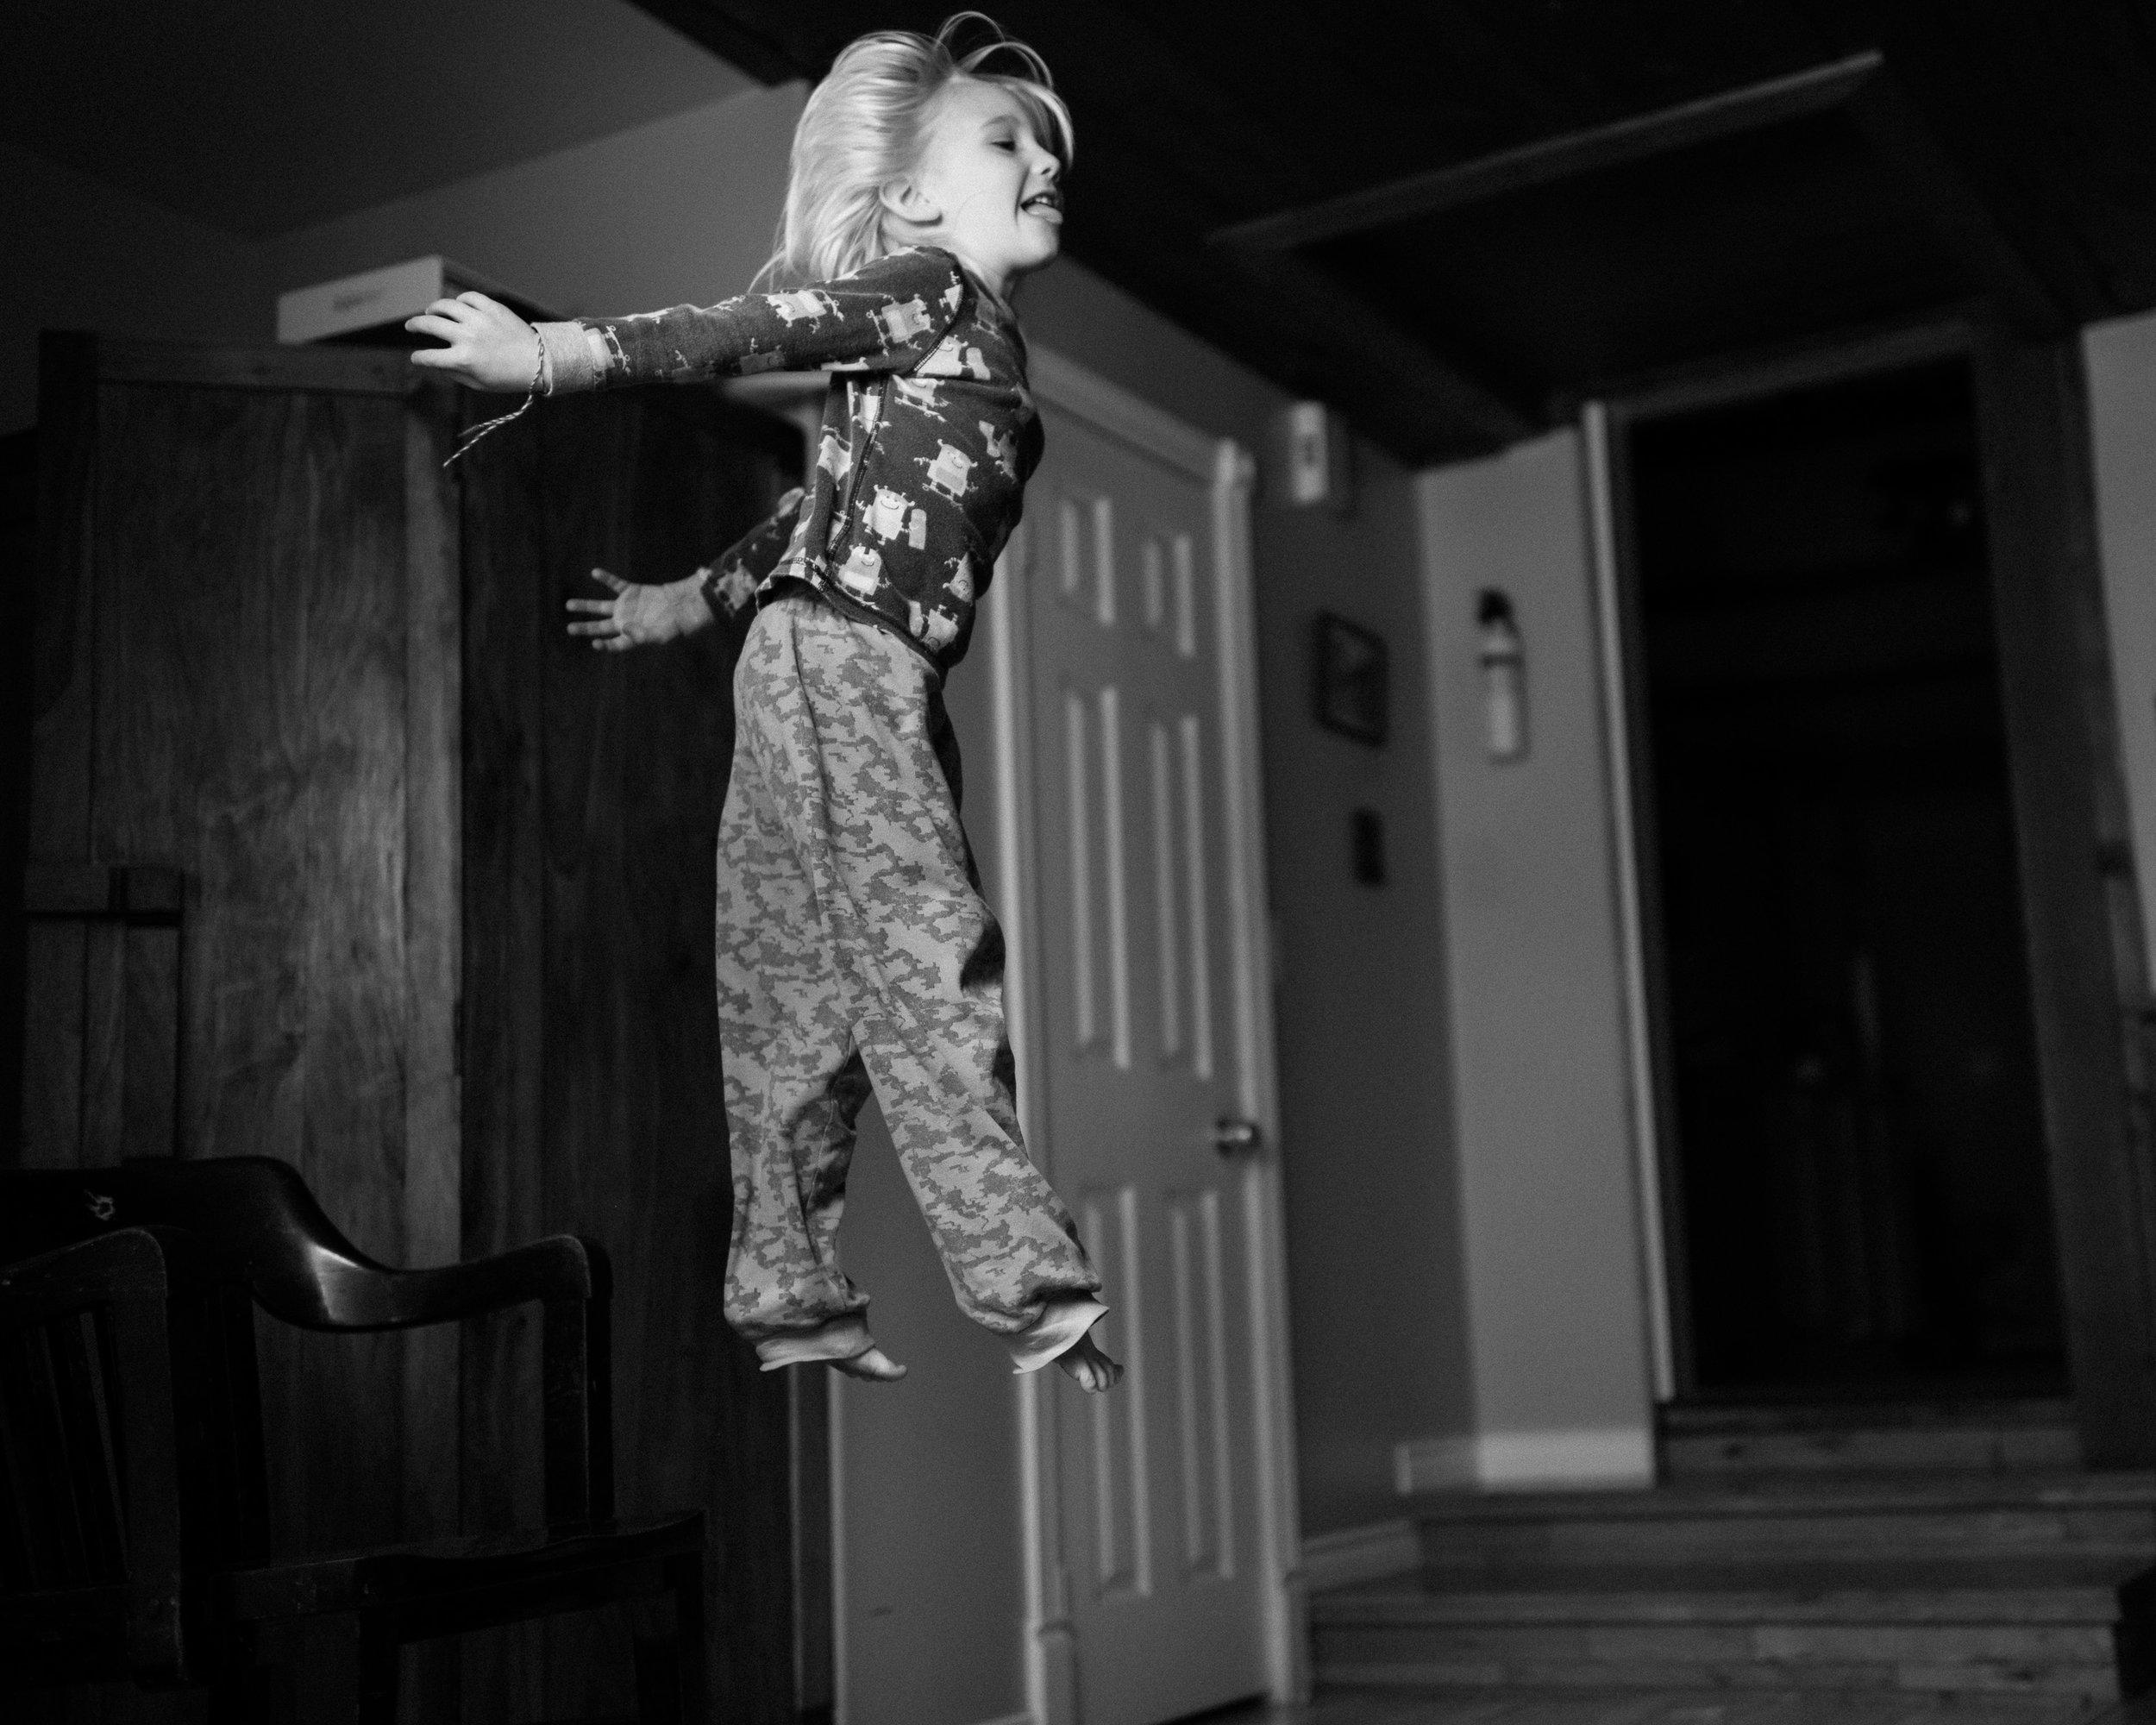 family documentary photography in kingston by viara mileva-145610vm.jpg